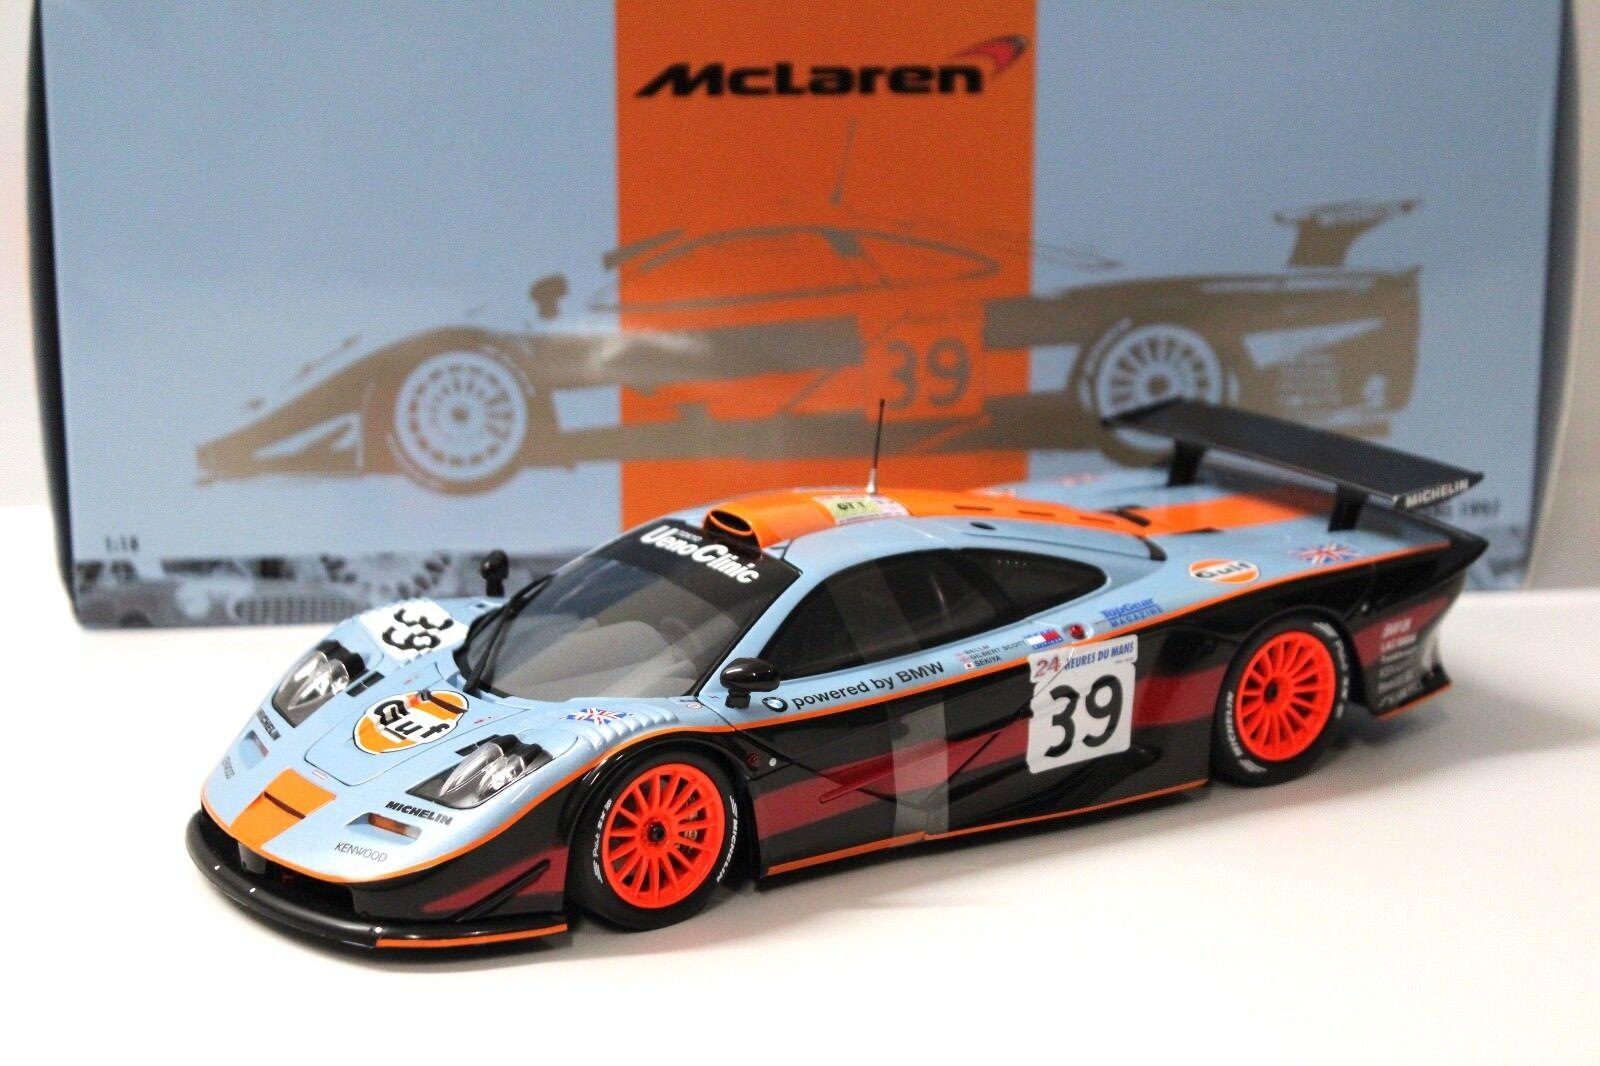 1 18 Minichamps McLaren F1 GTR Long Tail LM Gulf NY bei PREMIUM -modelllllerKARS